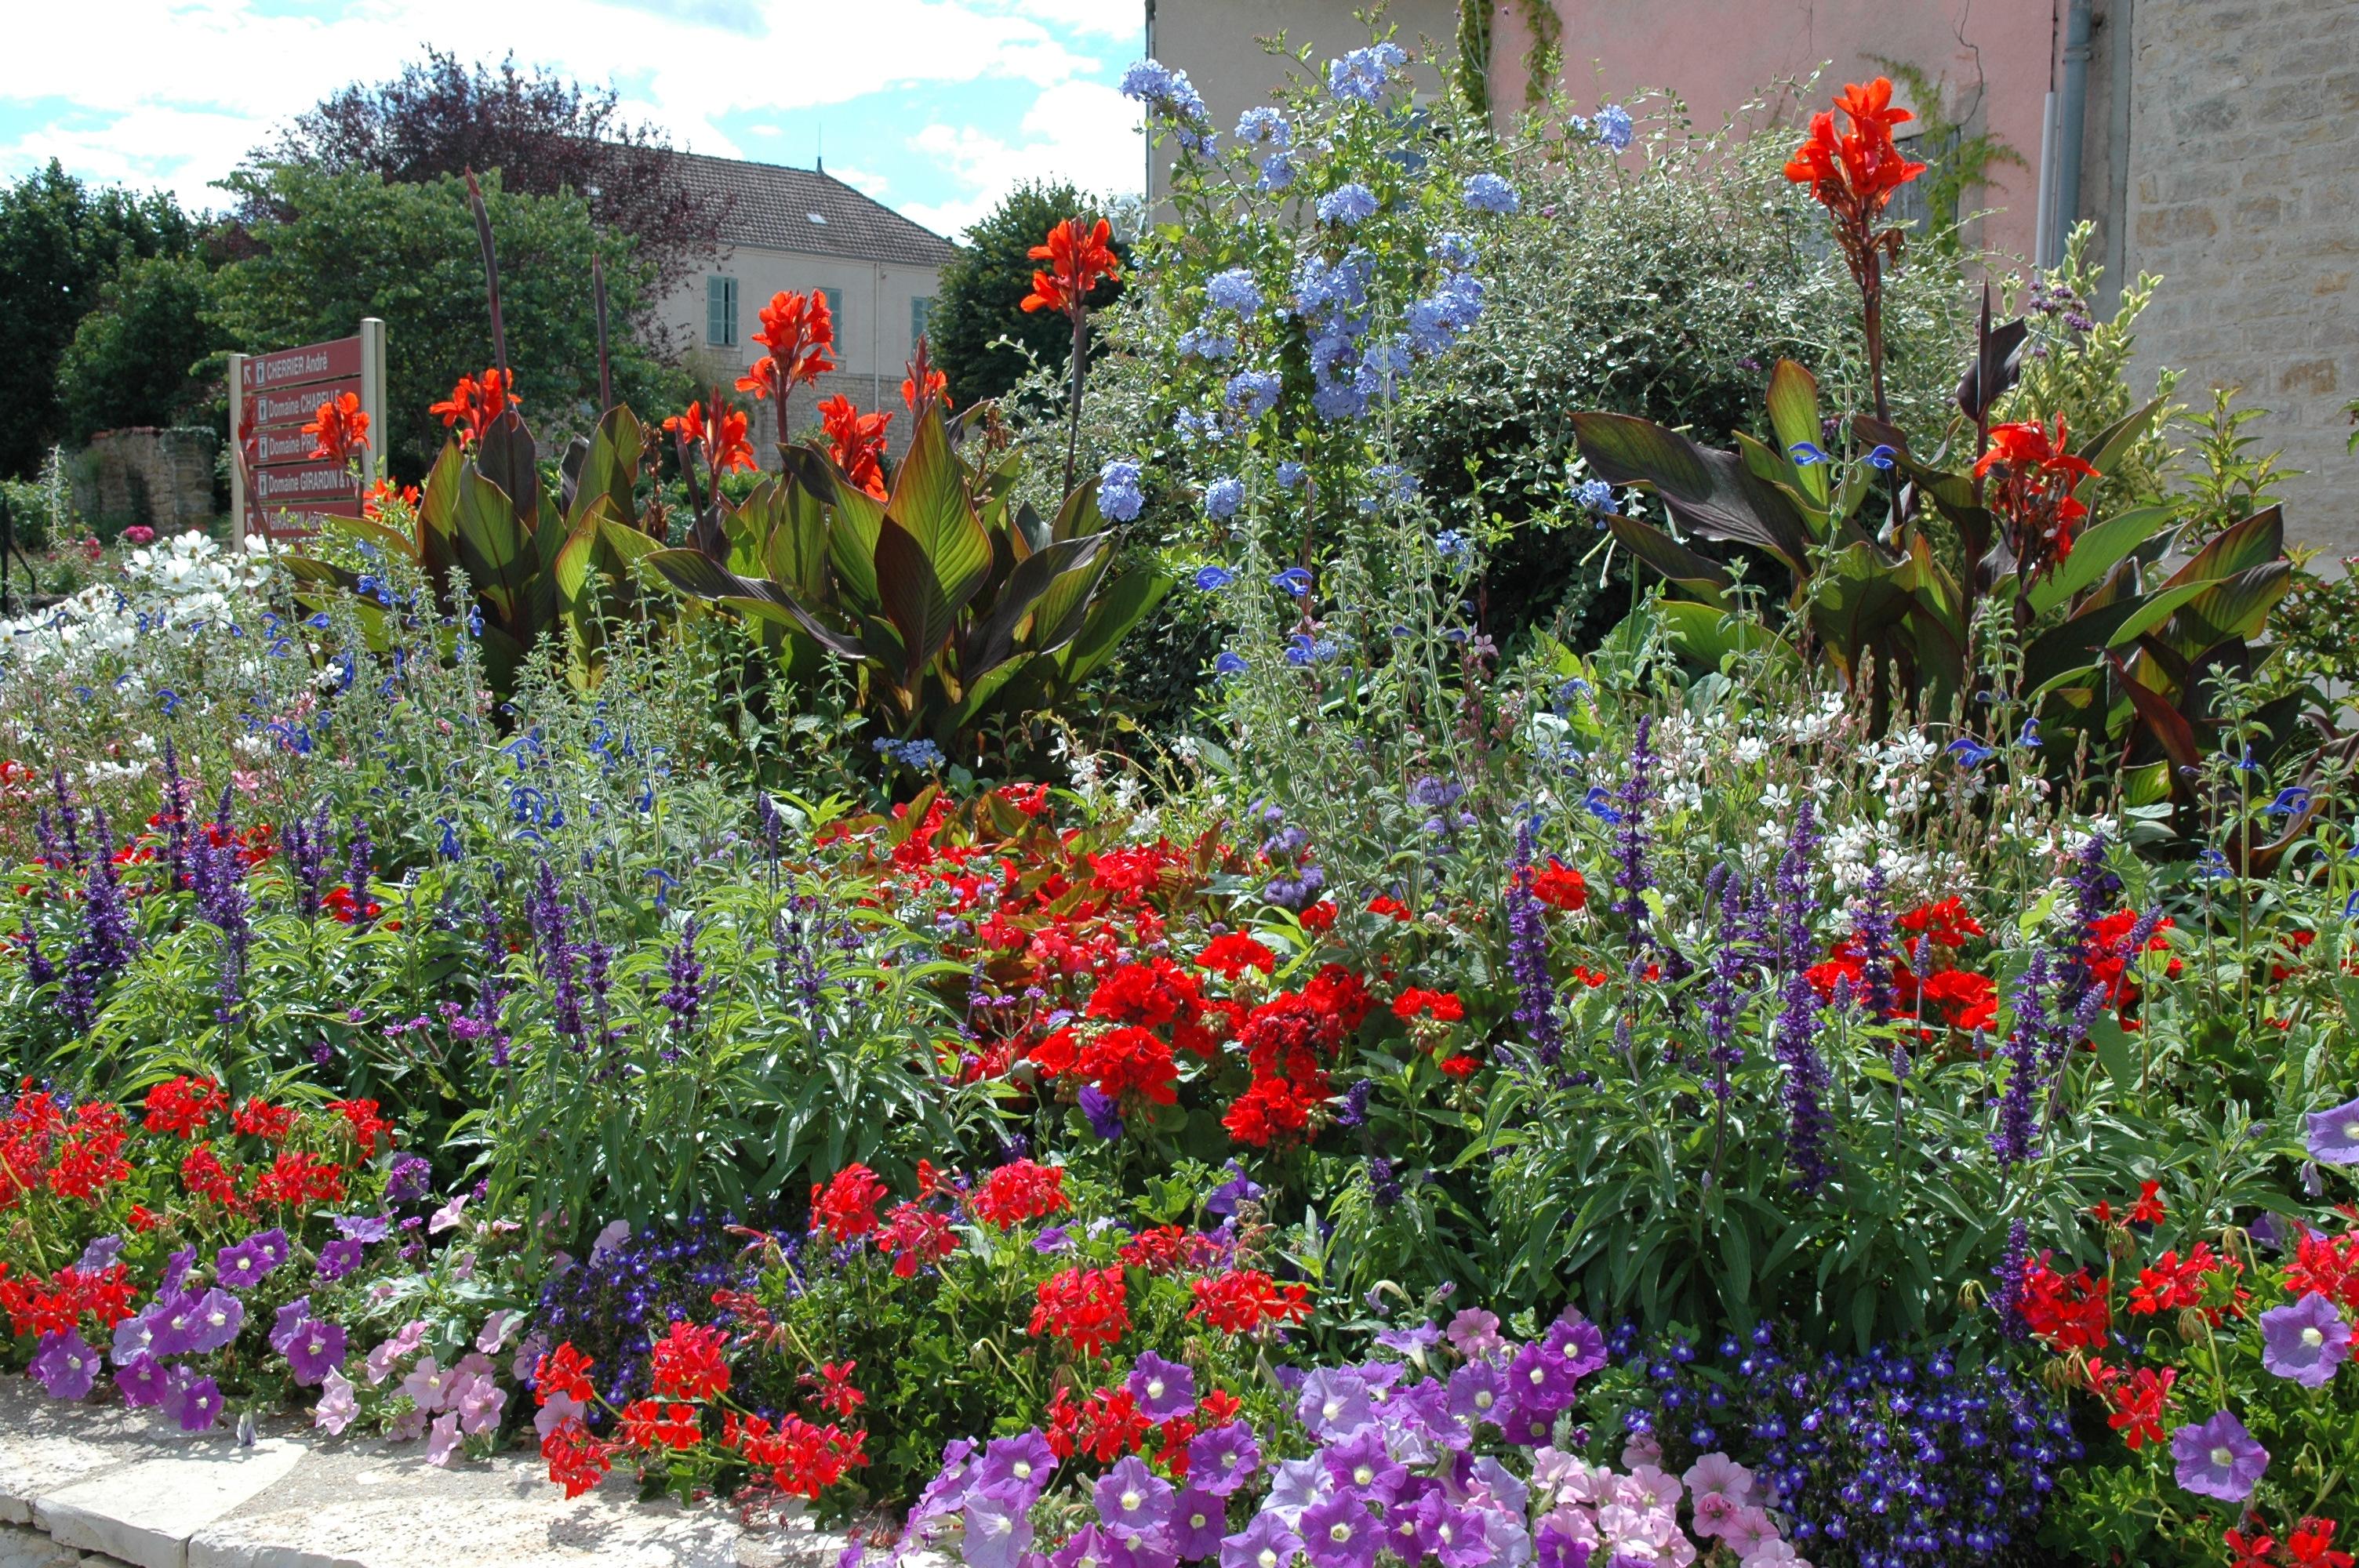 Harmonies de couleurs au jardin jardinier conseil for Jardinier conseil